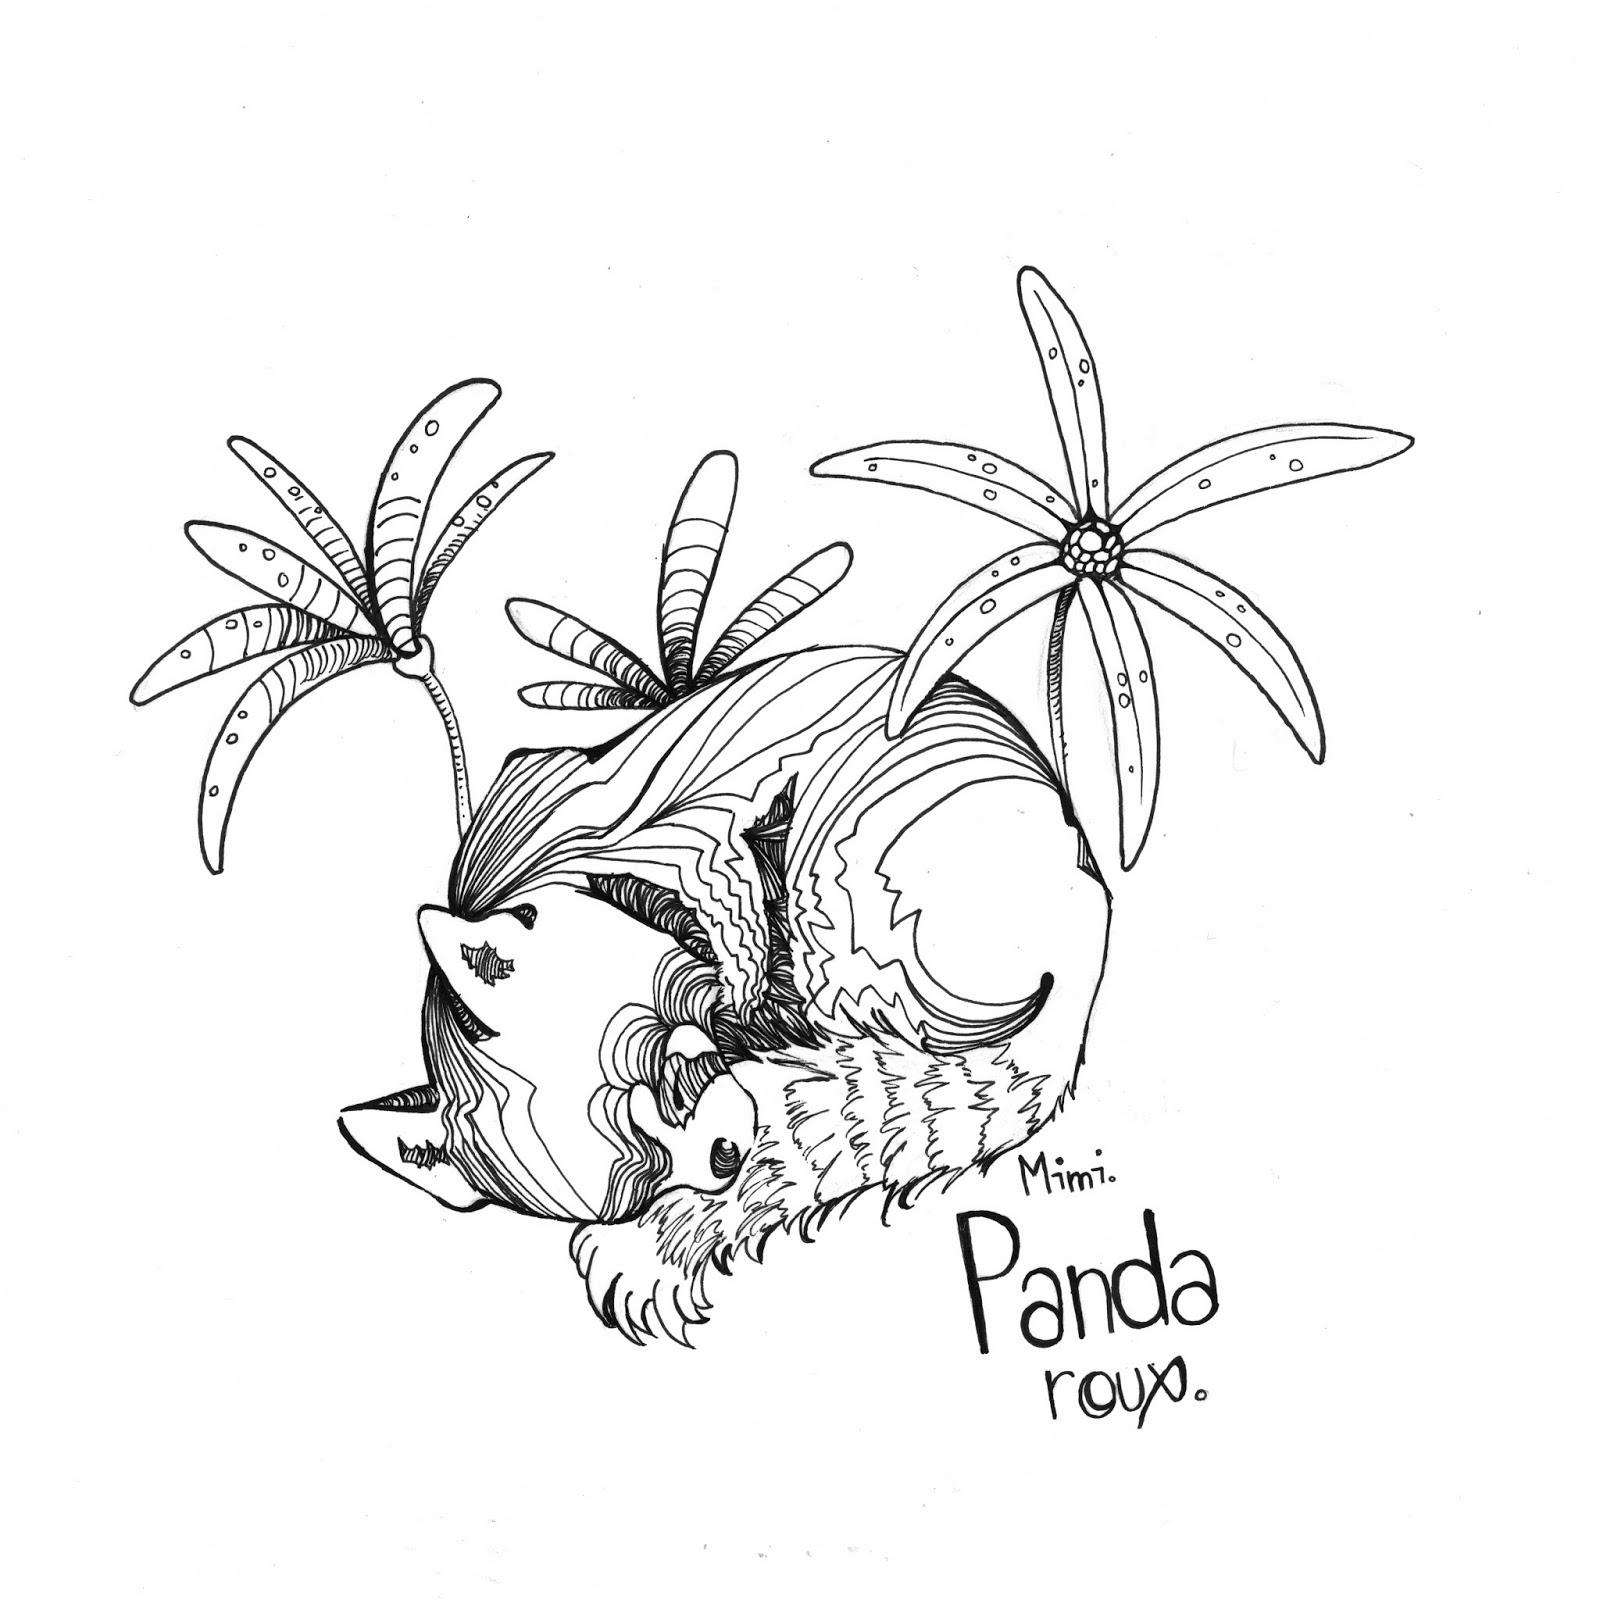 Mimidraw poissons zombies - Coloriage panda roux mandala ...